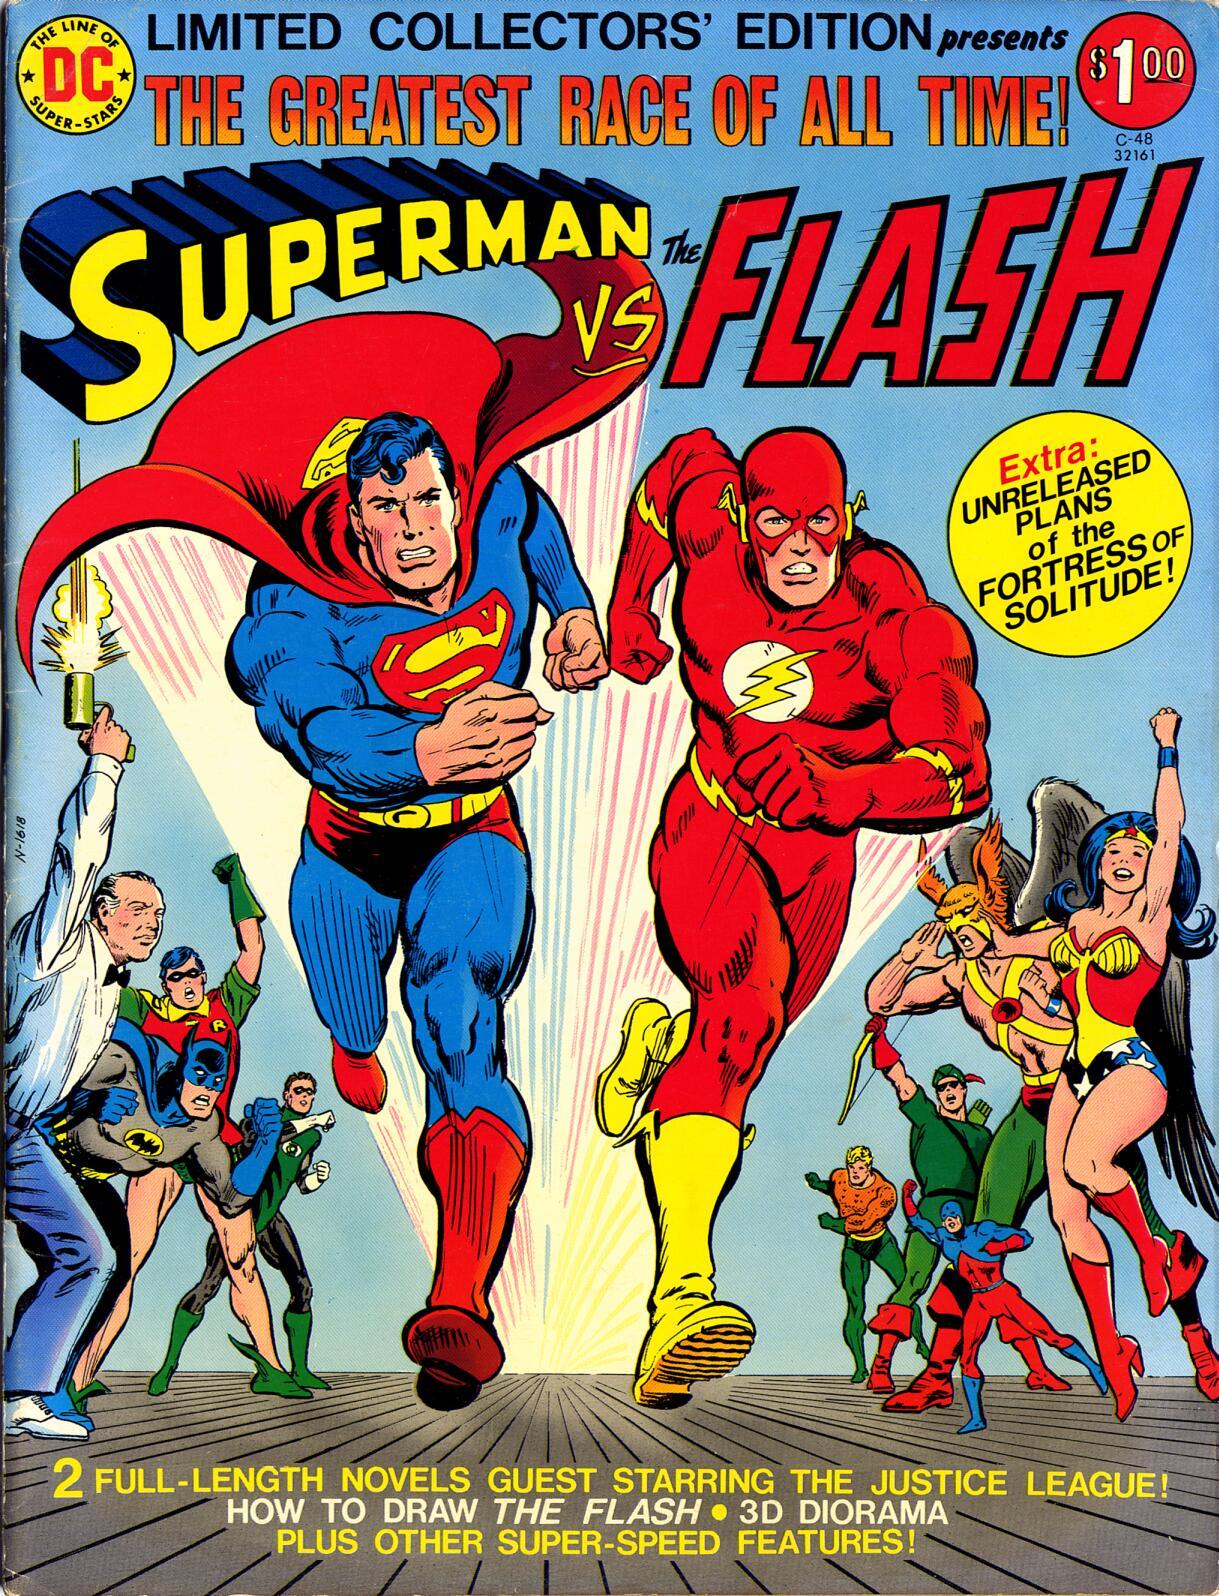 Why I like The Flash | Harry Heckel